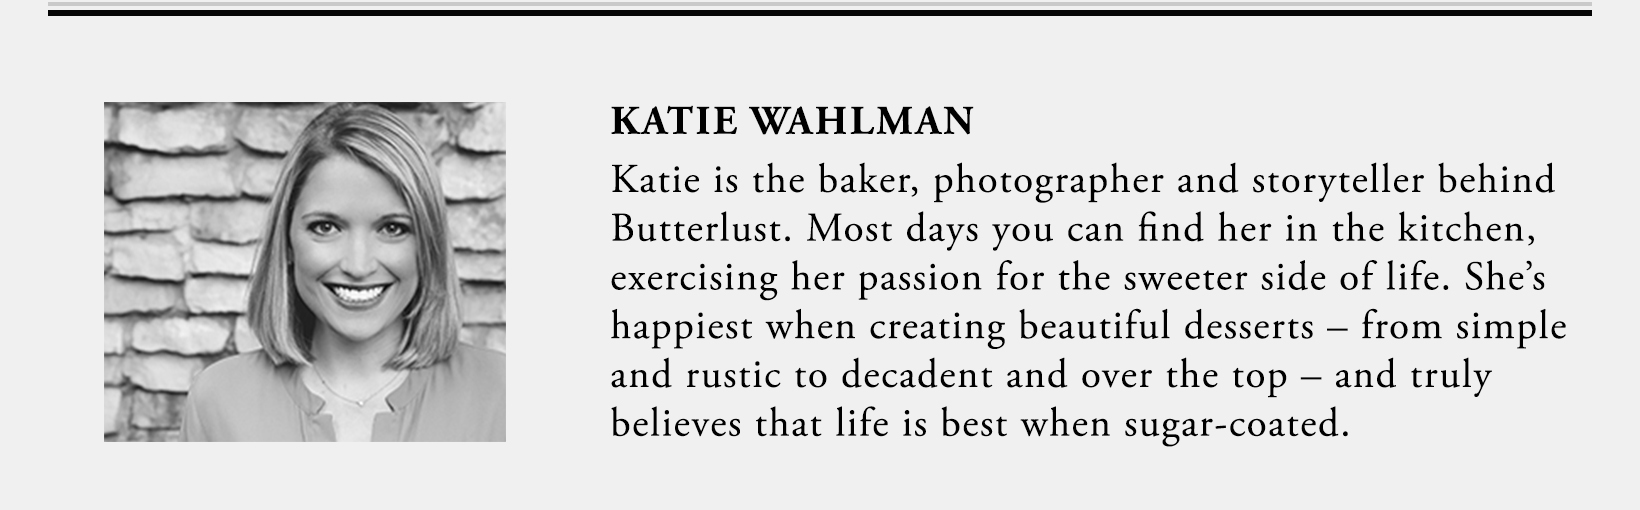 Katie Wahlman, Butterlust Blog